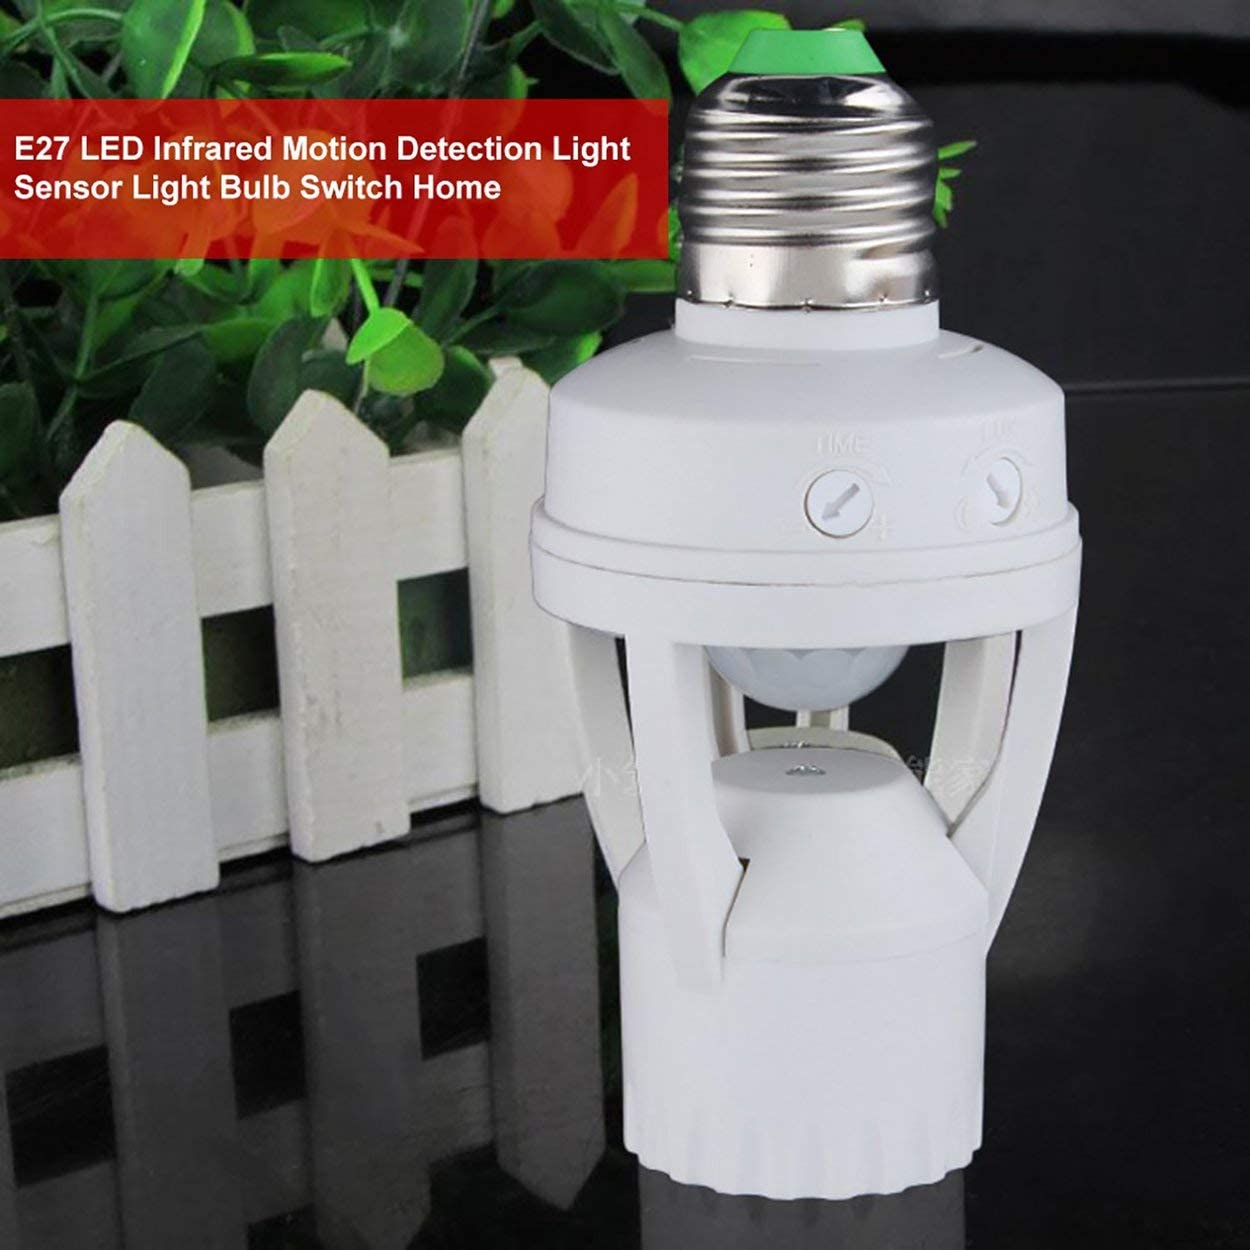 Lodenlli E27 Enchufe Sensor de Movimiento de inducci/ón PIR de 360 Grados Sensor de detecci/ón de Movimiento por Infrarrojos Bombilla Enchufe Interruptor Soporte Base AC110-220V